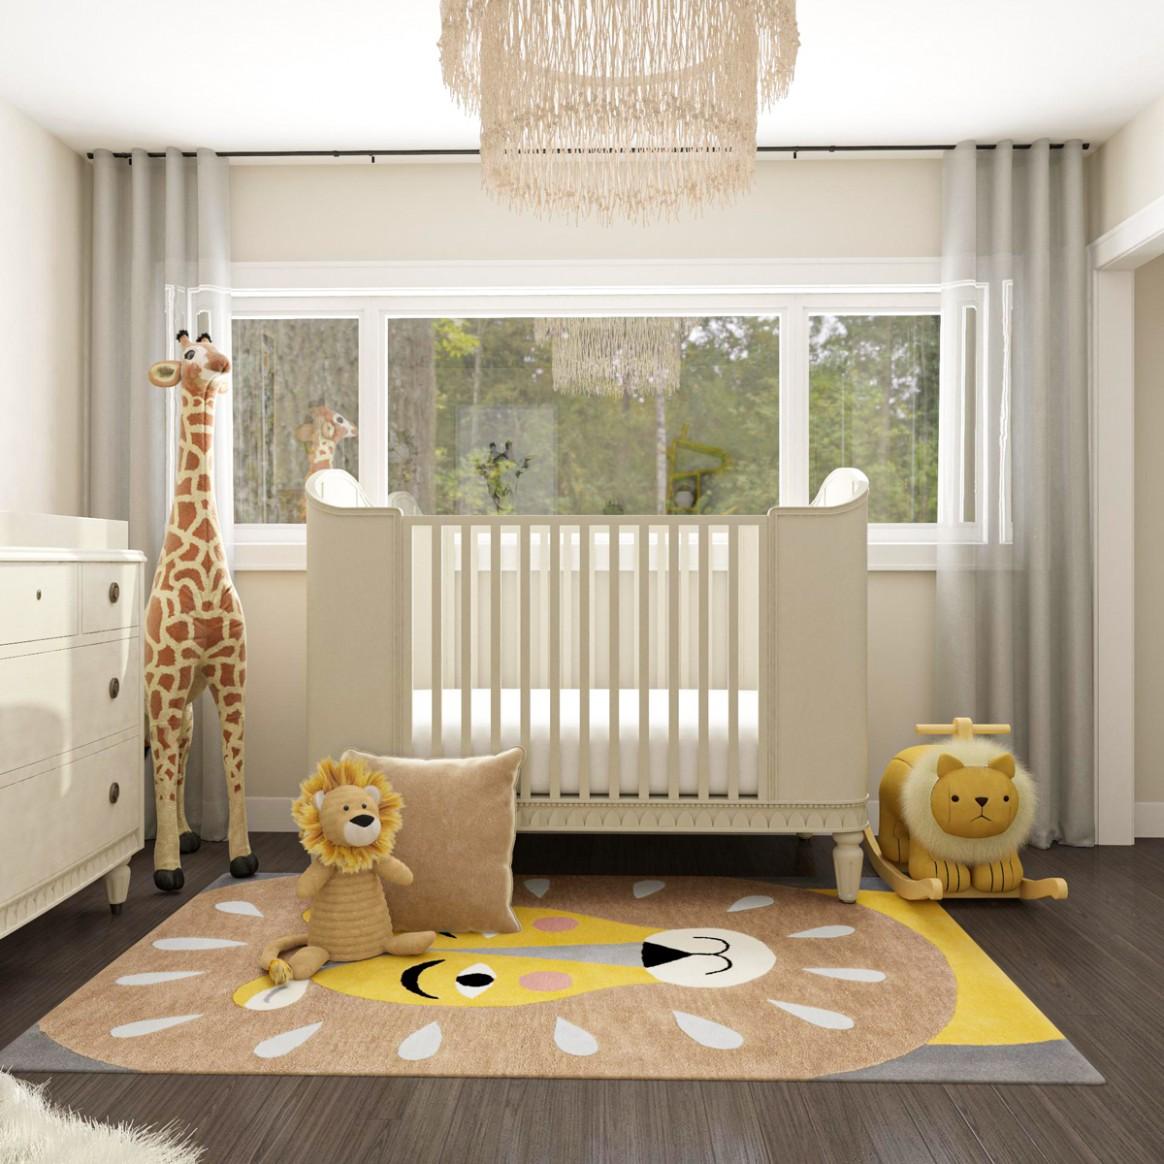 Nursery Design: 8 Trendy Ideas for a Gender-Neutral Nursery - Baby Room Neutral